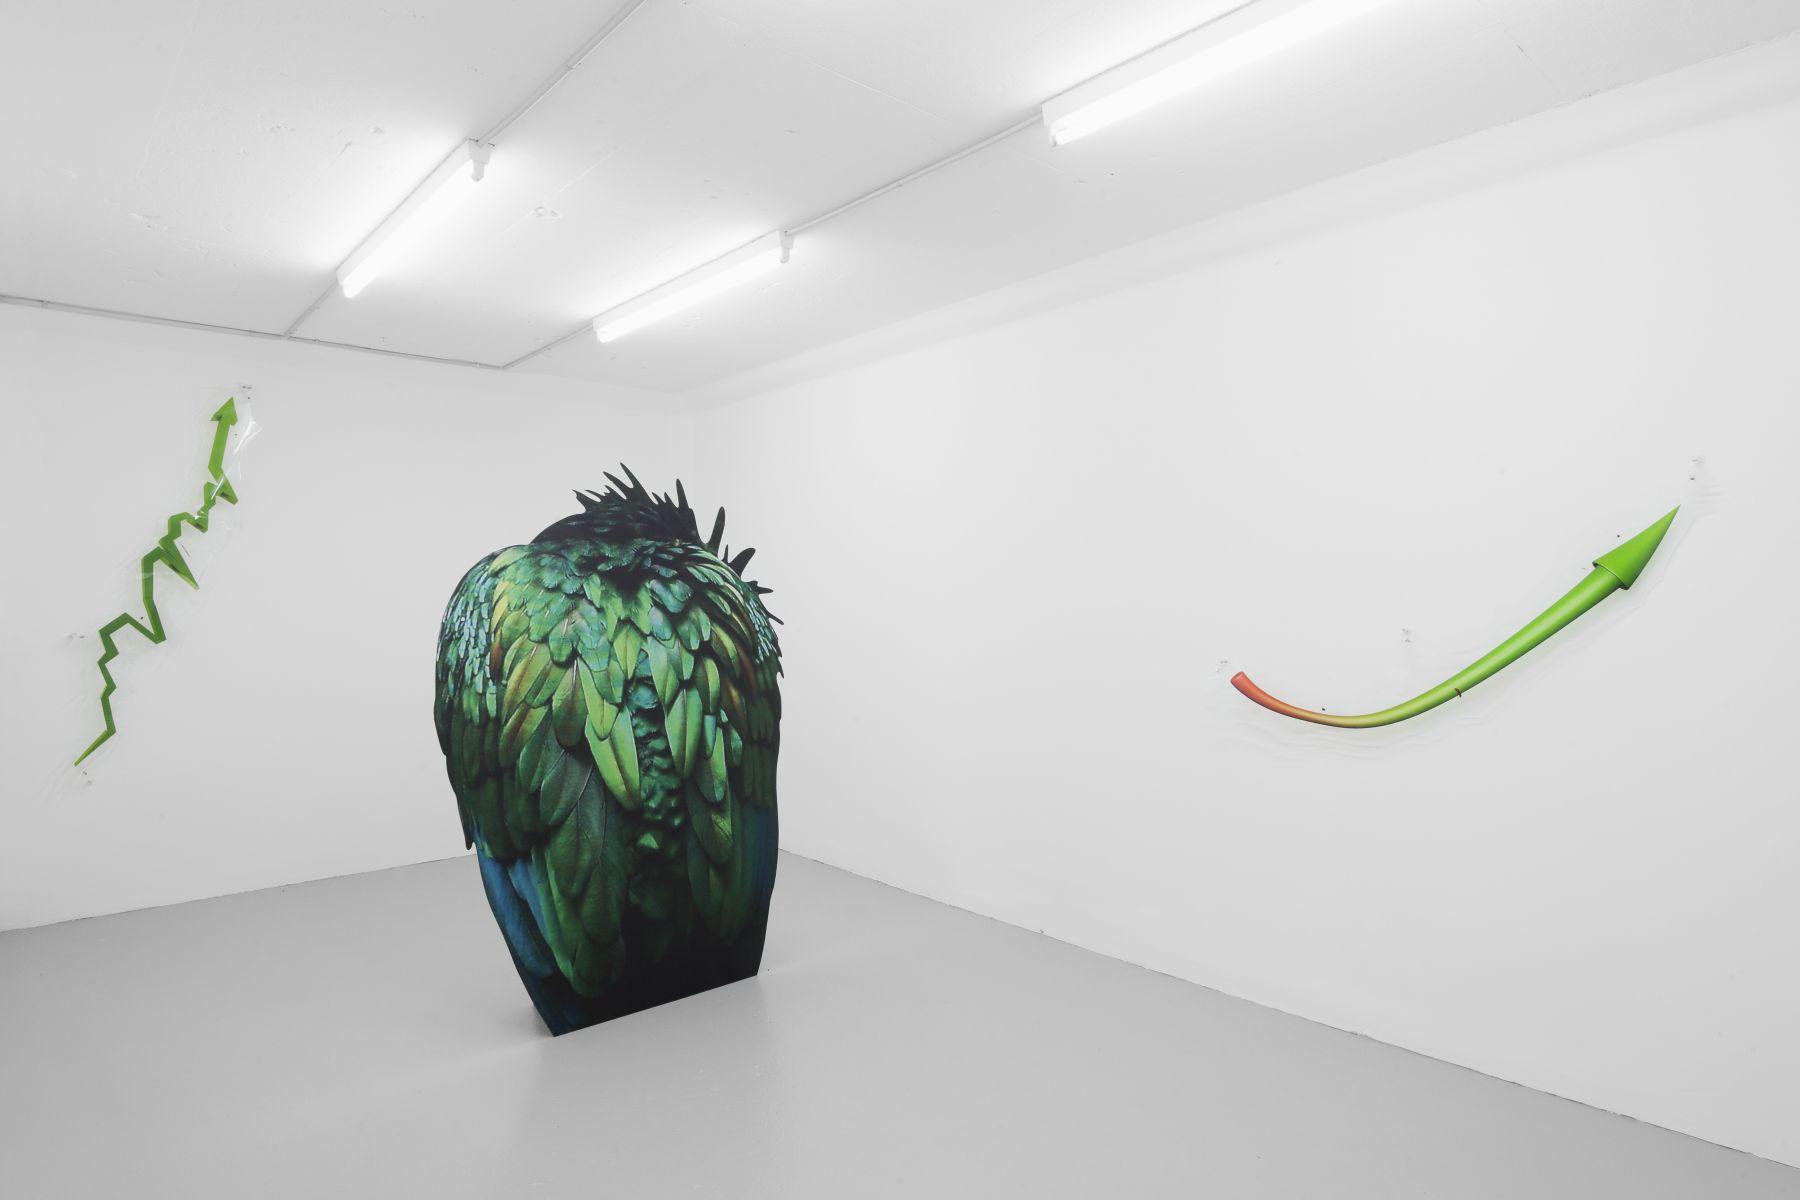 Katja Novitskova, Installation view,Green Growth, Salts, Basel, 2014